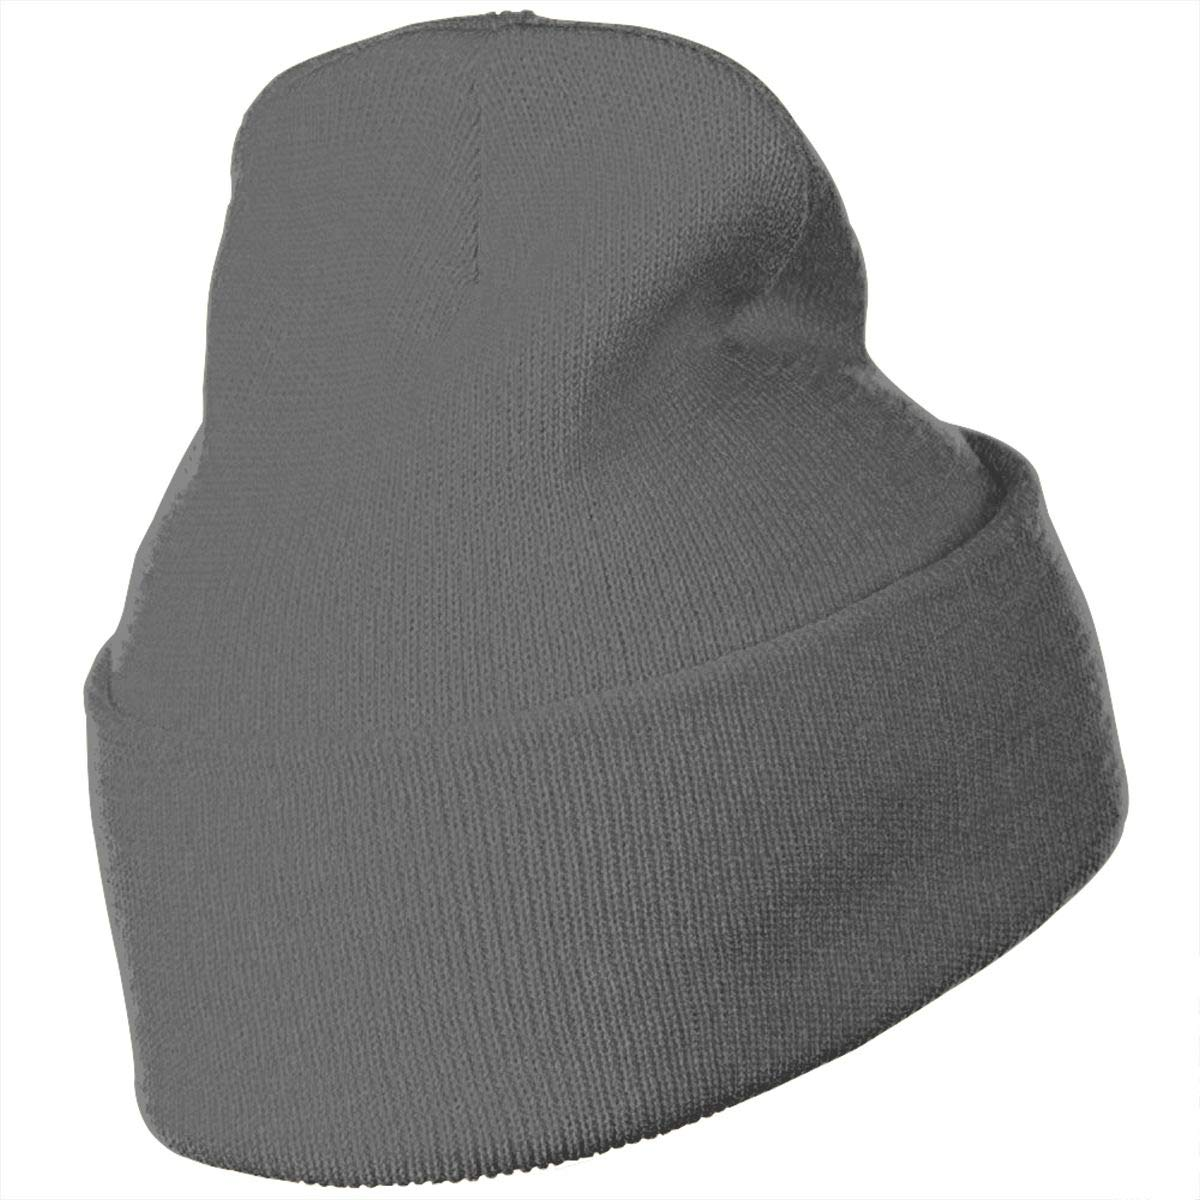 Big Set of Cartoon Animals Unisex Fashion Knitted Hat Luxury Hip-Hop Cap